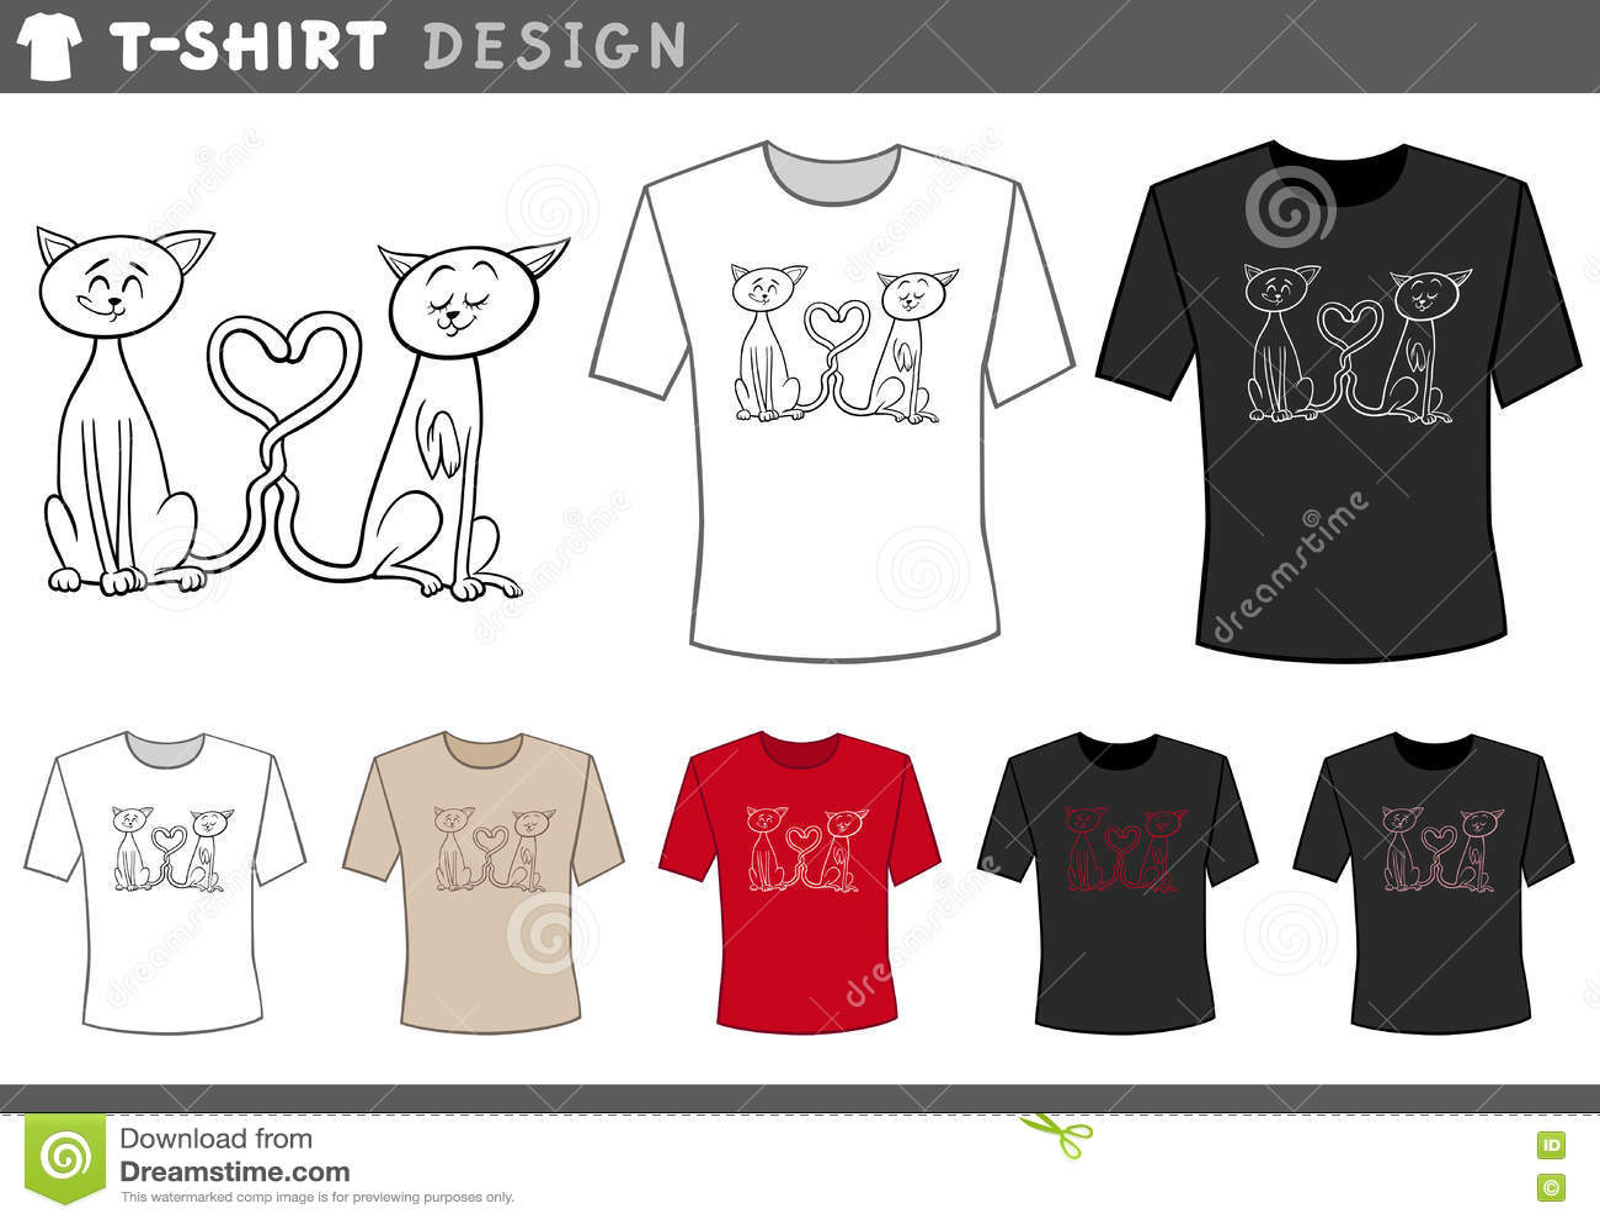 ba7d3d716f Couple Shirt Design Free Download